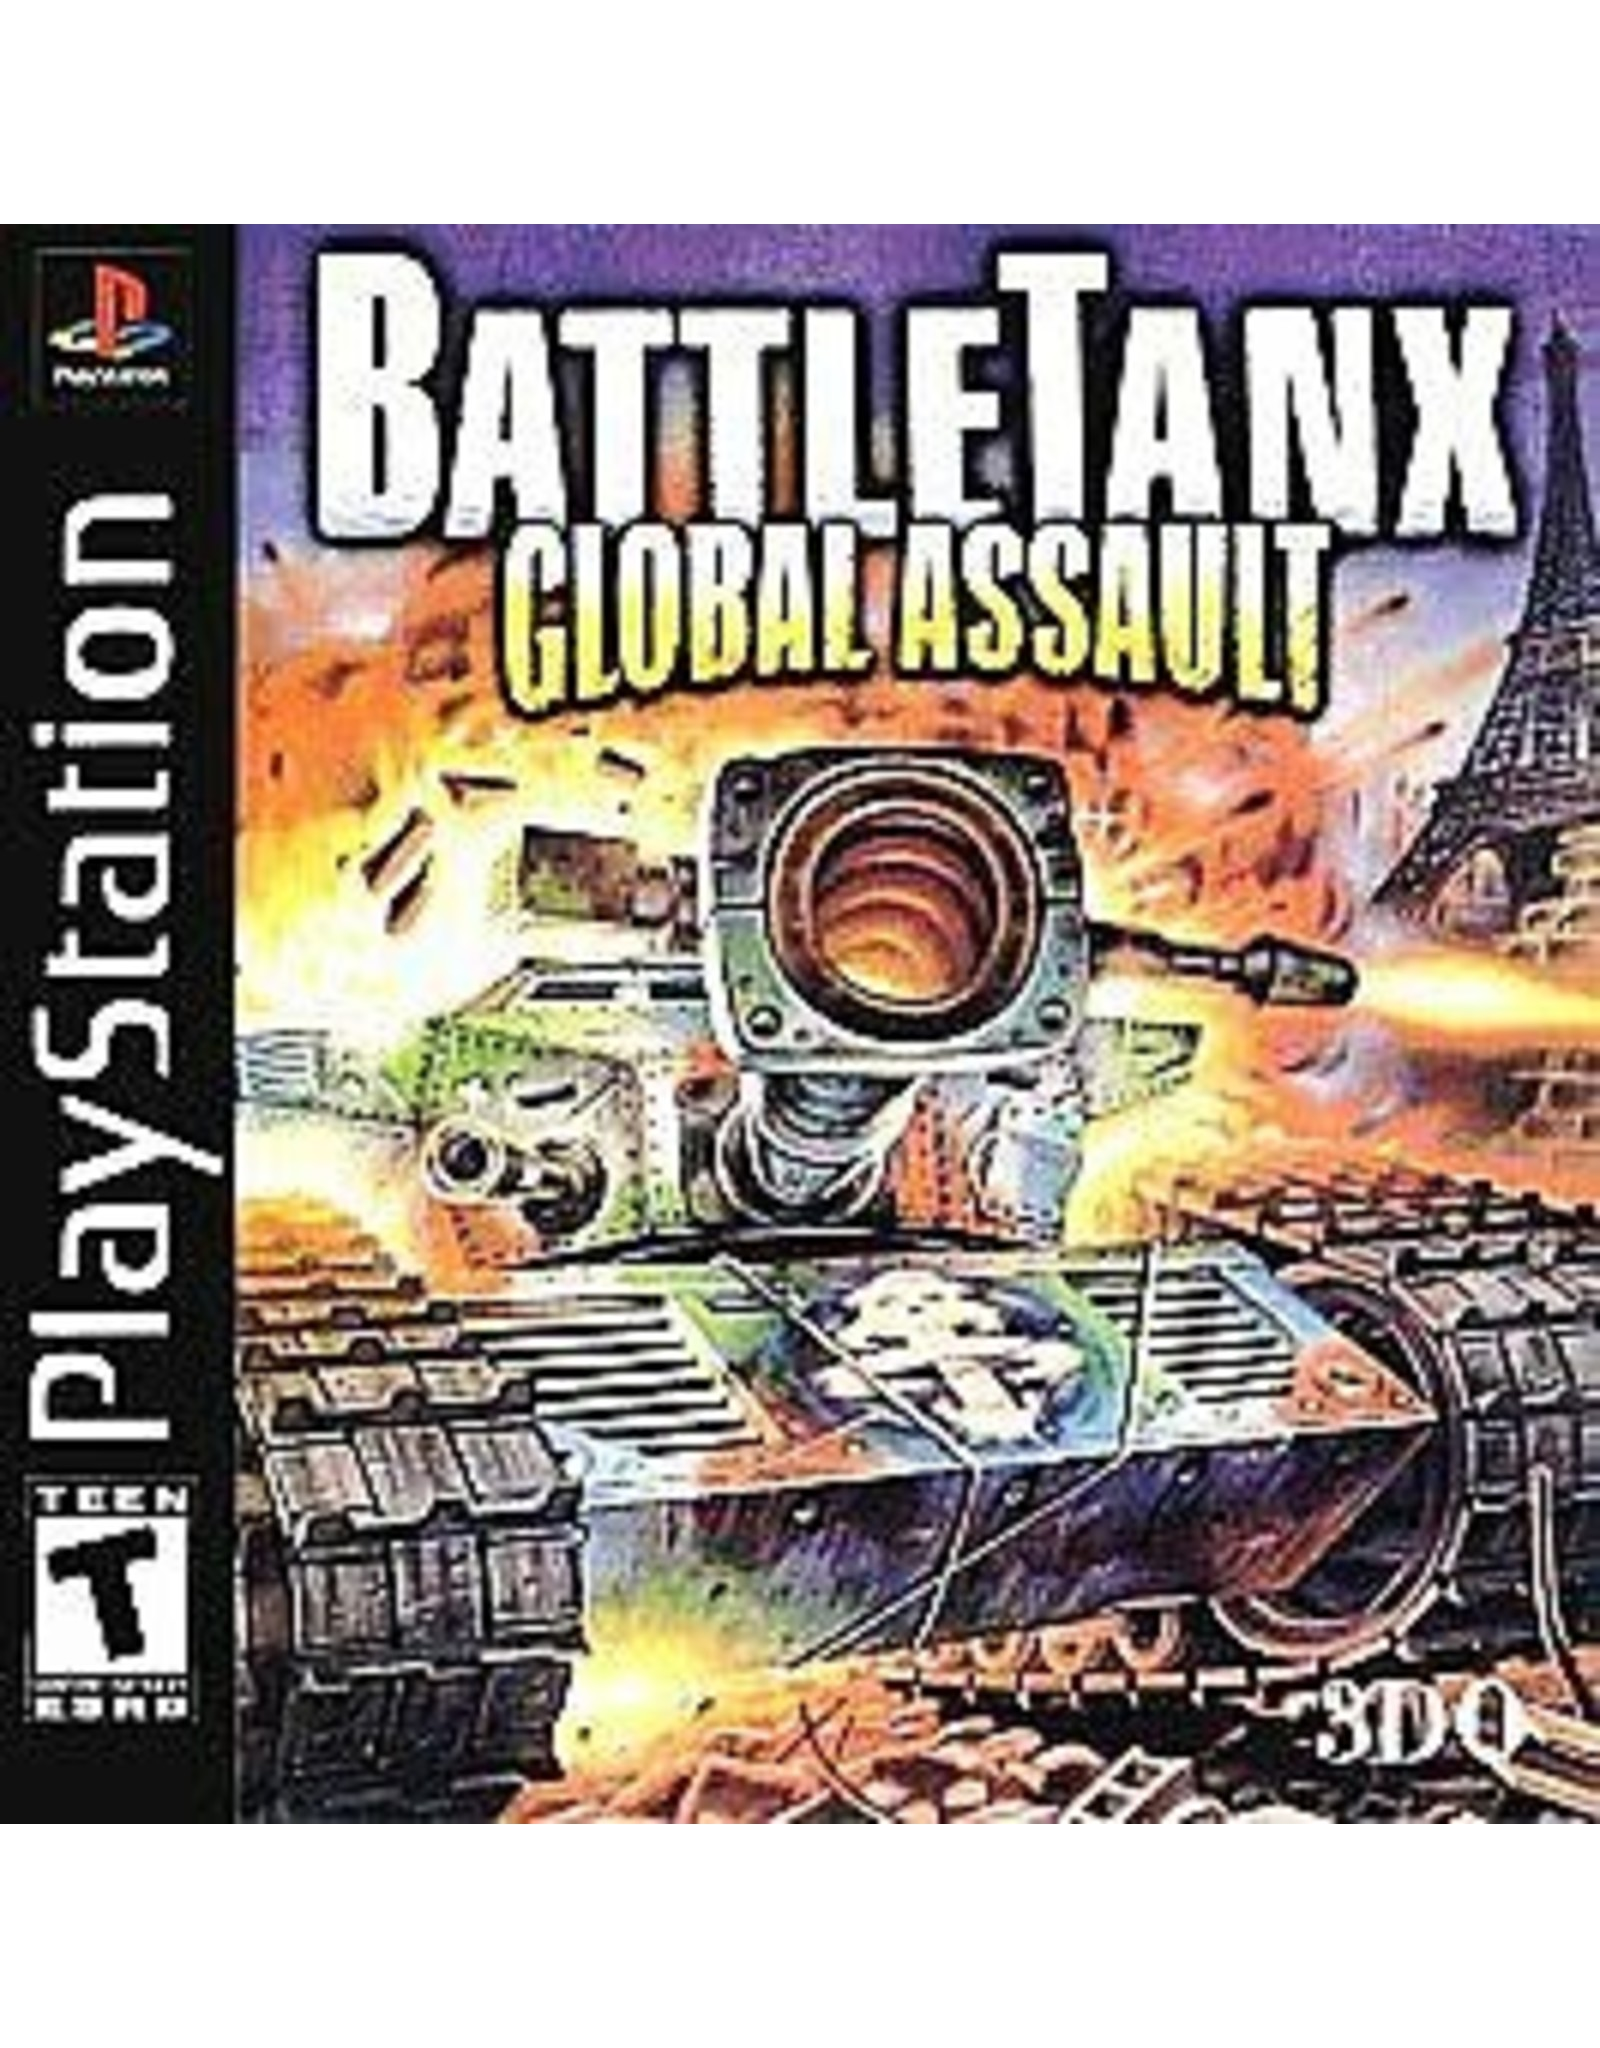 Playstation Battletanx Global Assault (CiB)